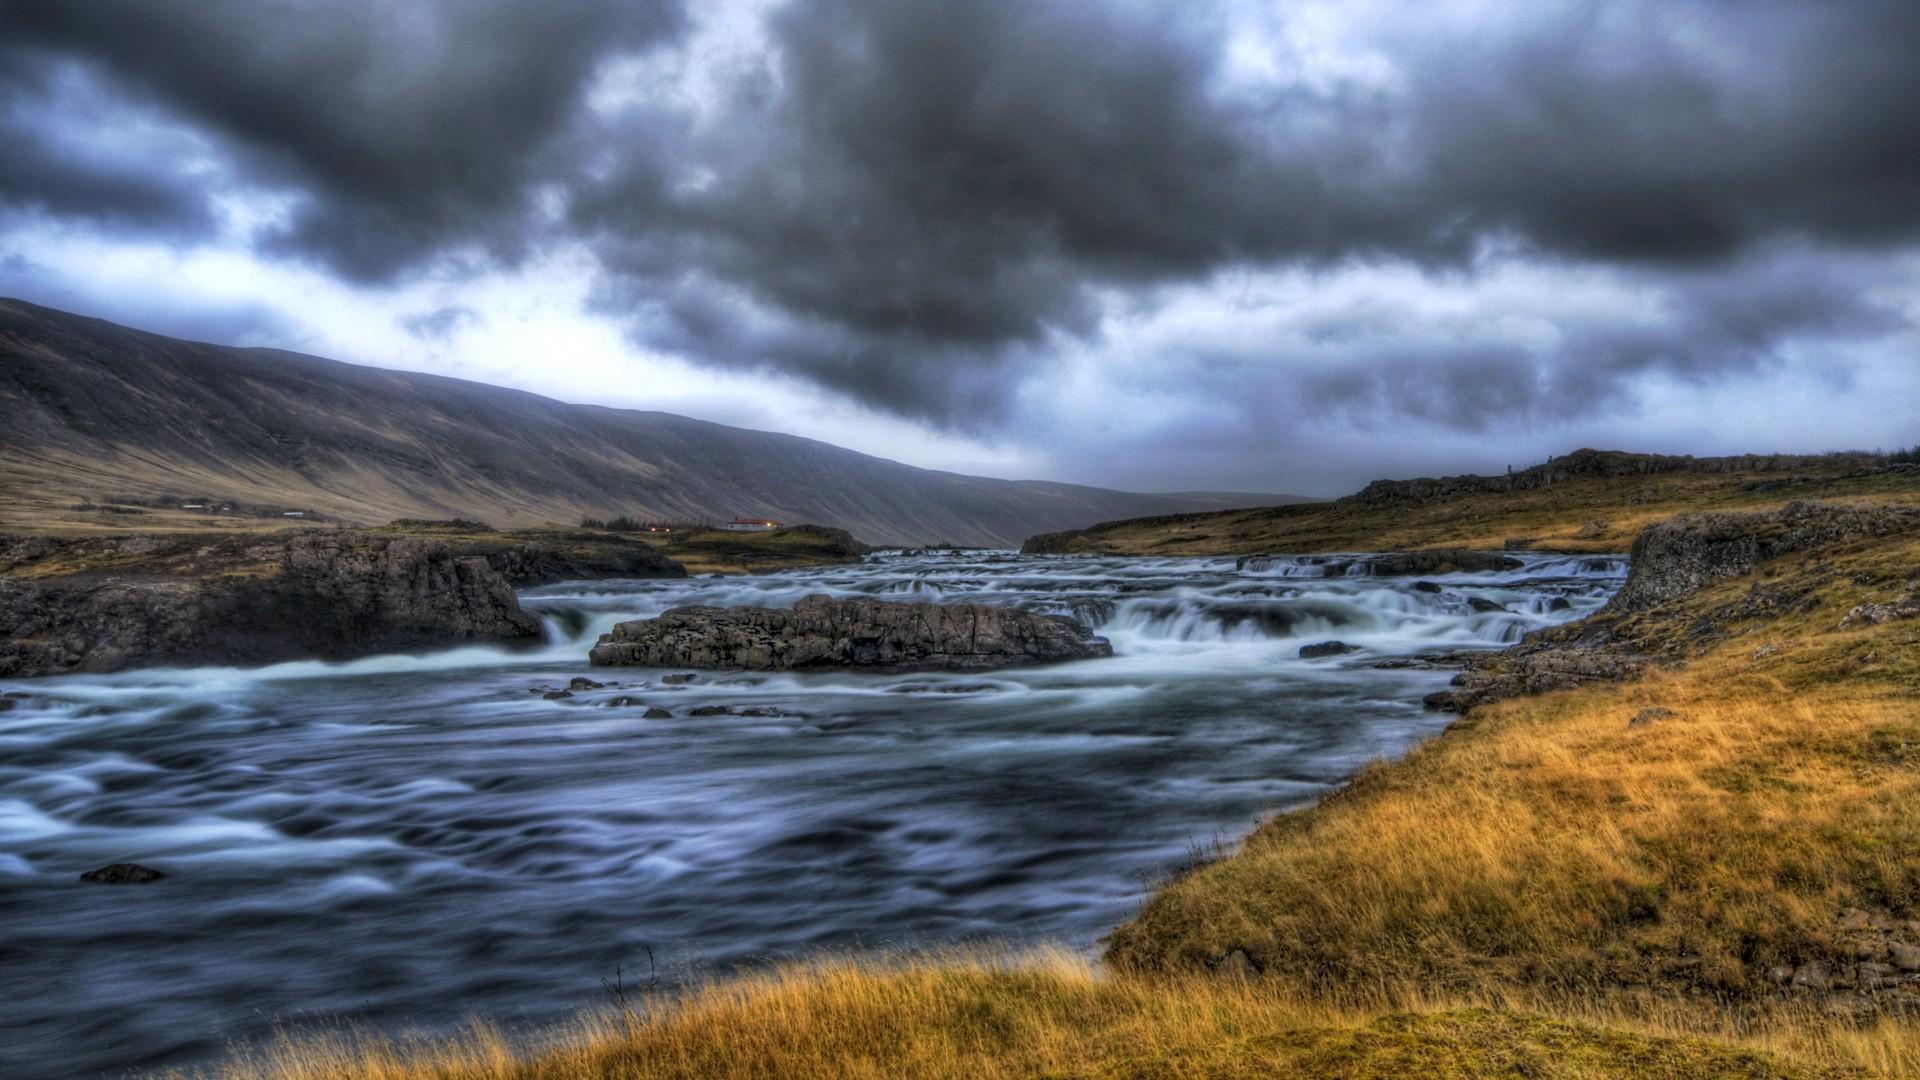 Iceland Landscape Wallpaper, Art Print, Poster, Wallpapers